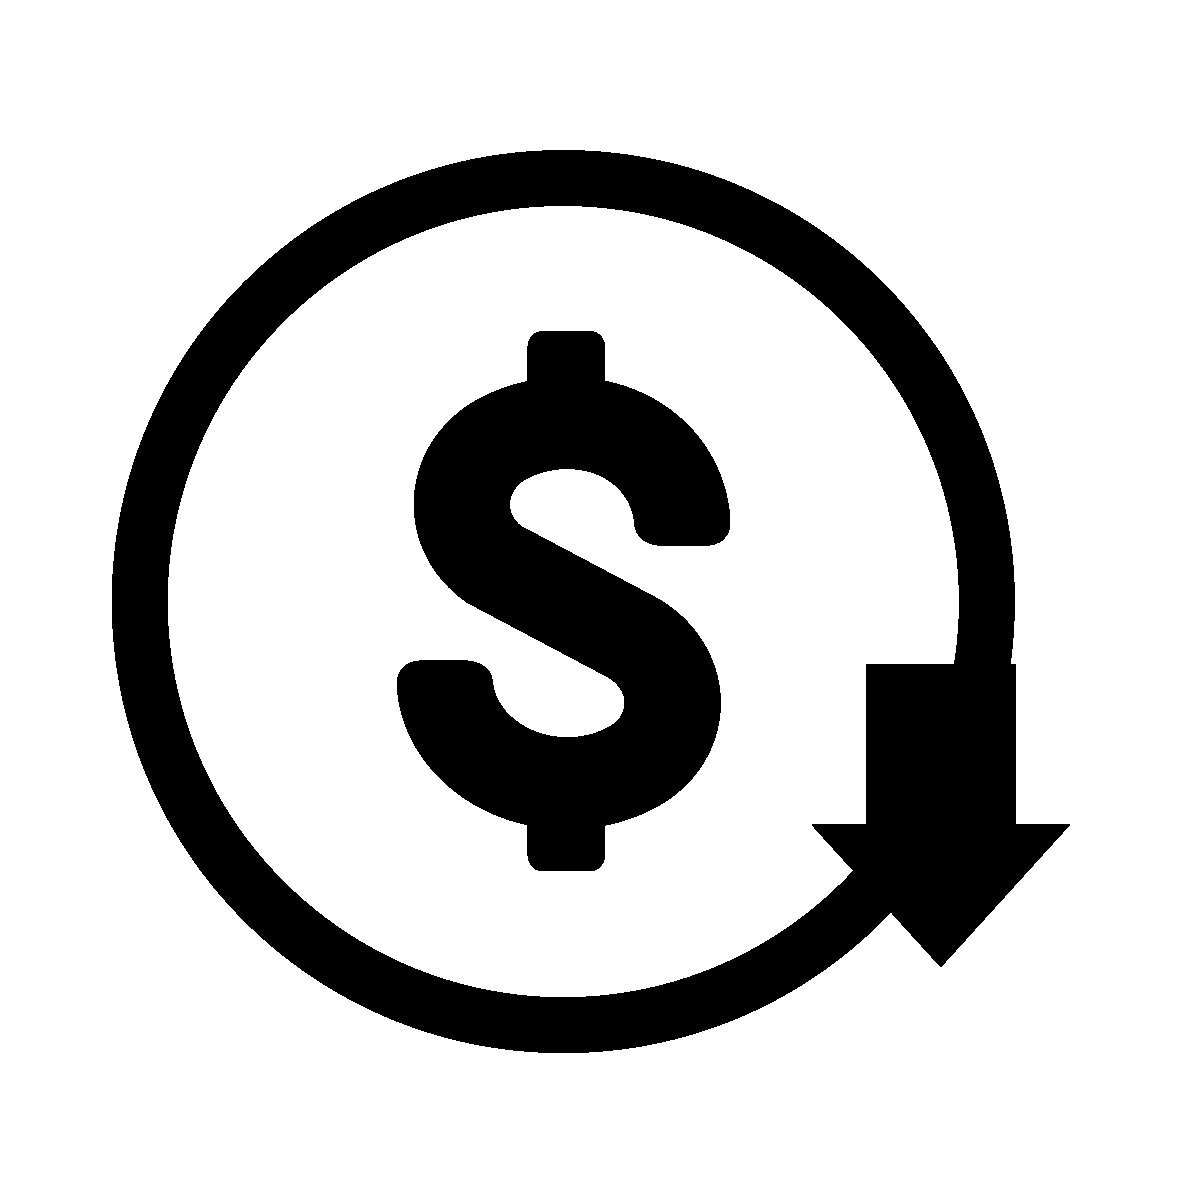 Benefit 1 image